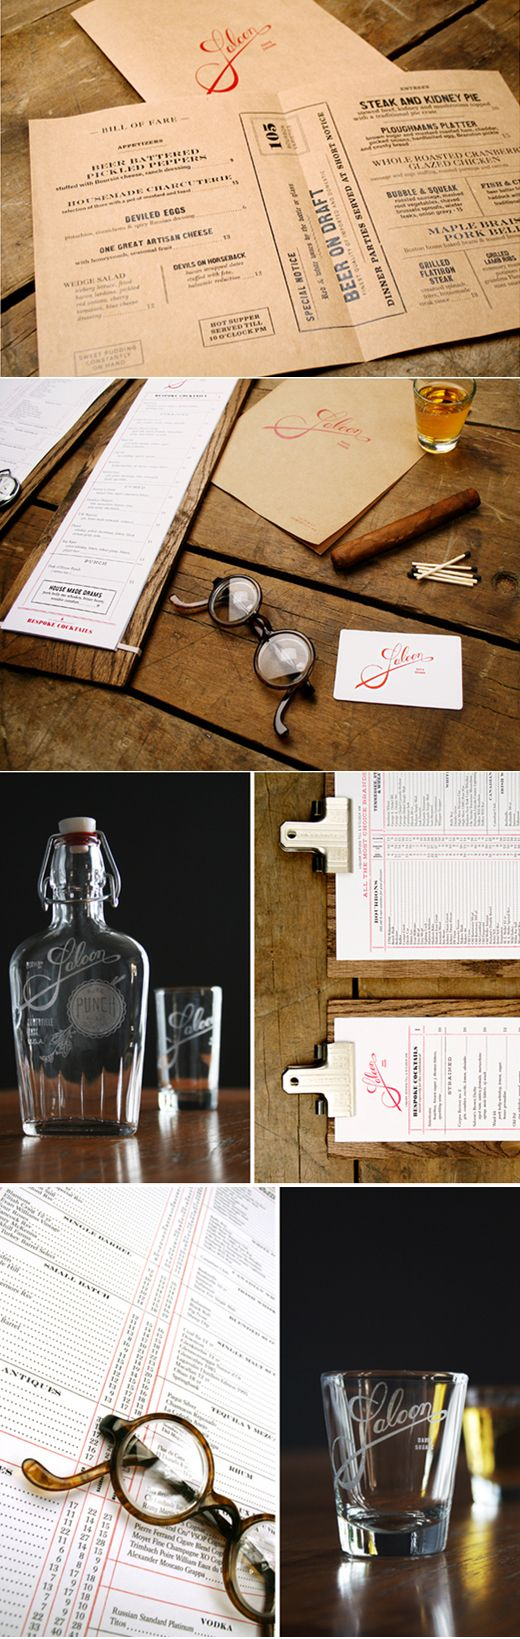 Art of the Menu - 10 of the Most Inspiring Menu & Restaurant Brandings